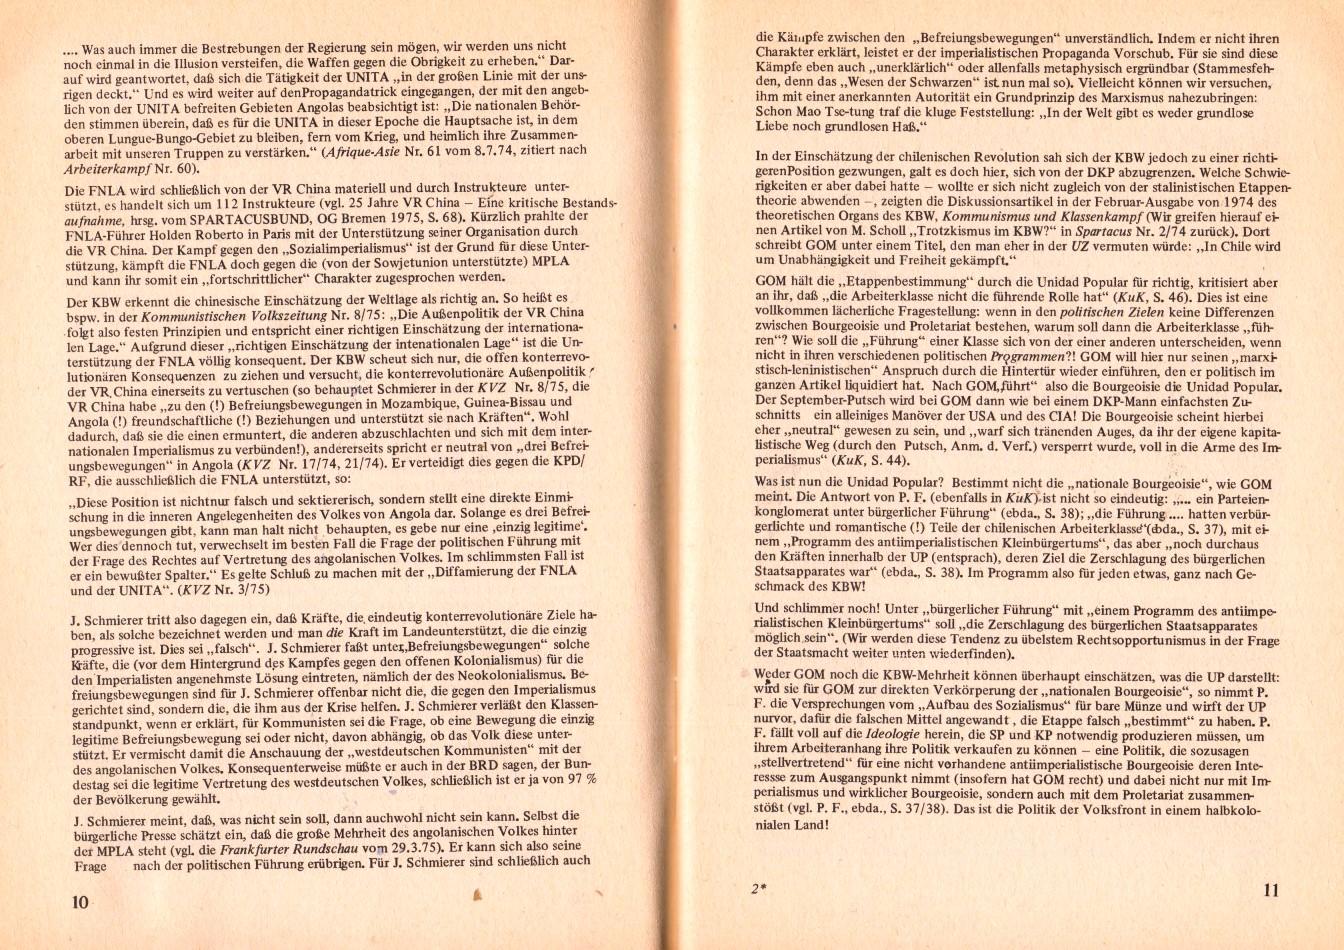 Spartacus_1975_Kritik_des_KBW_07